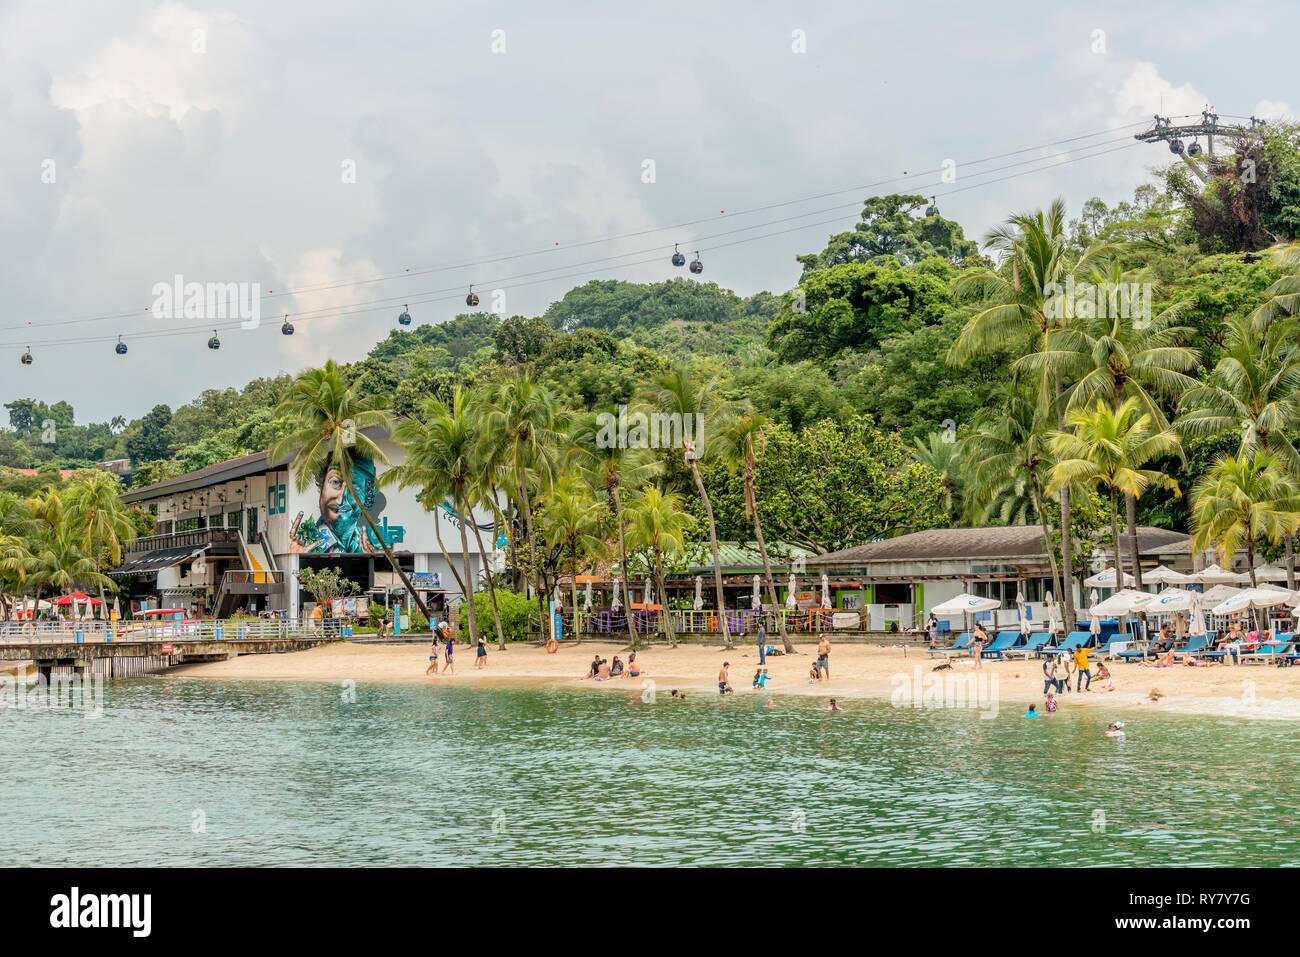 Palawan Beach on Sentosa Island, Singapore | Palawan Strand auf der Insel Sentosa, Singapur Stock Photo